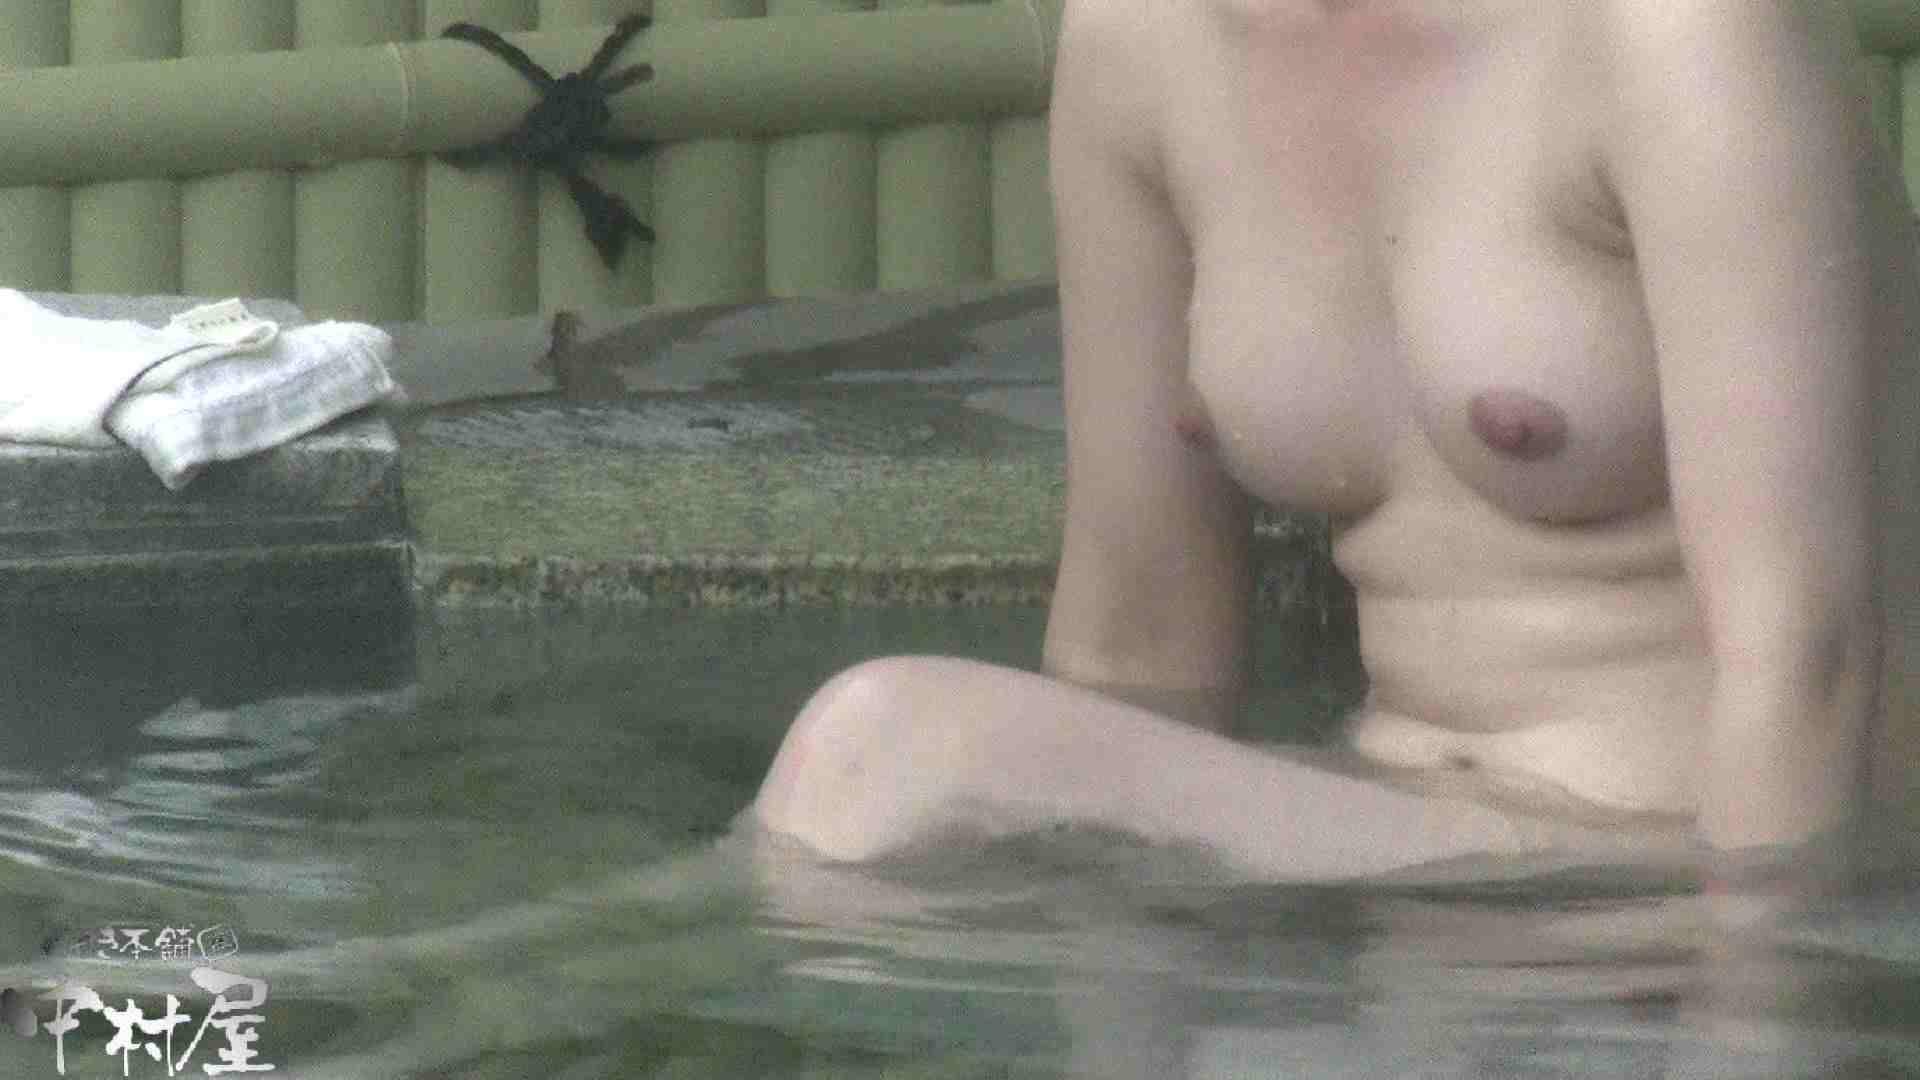 Aquaな露天風呂Vol.912 露天 AV無料動画キャプチャ 62画像 41